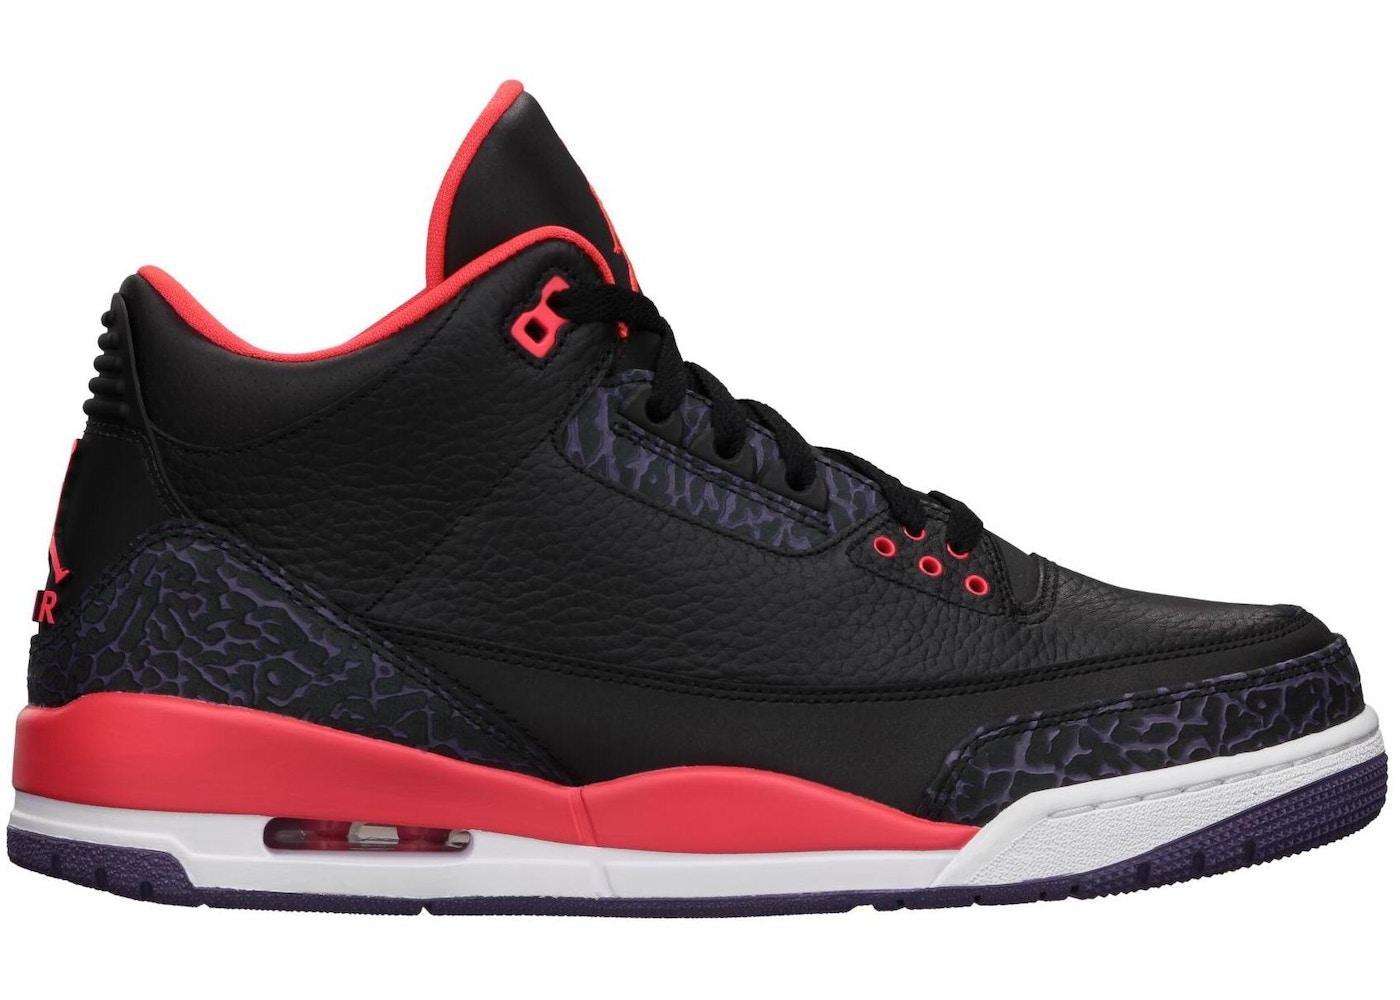 new styles 03c11 25455 Jordan 3 Retro Crimson